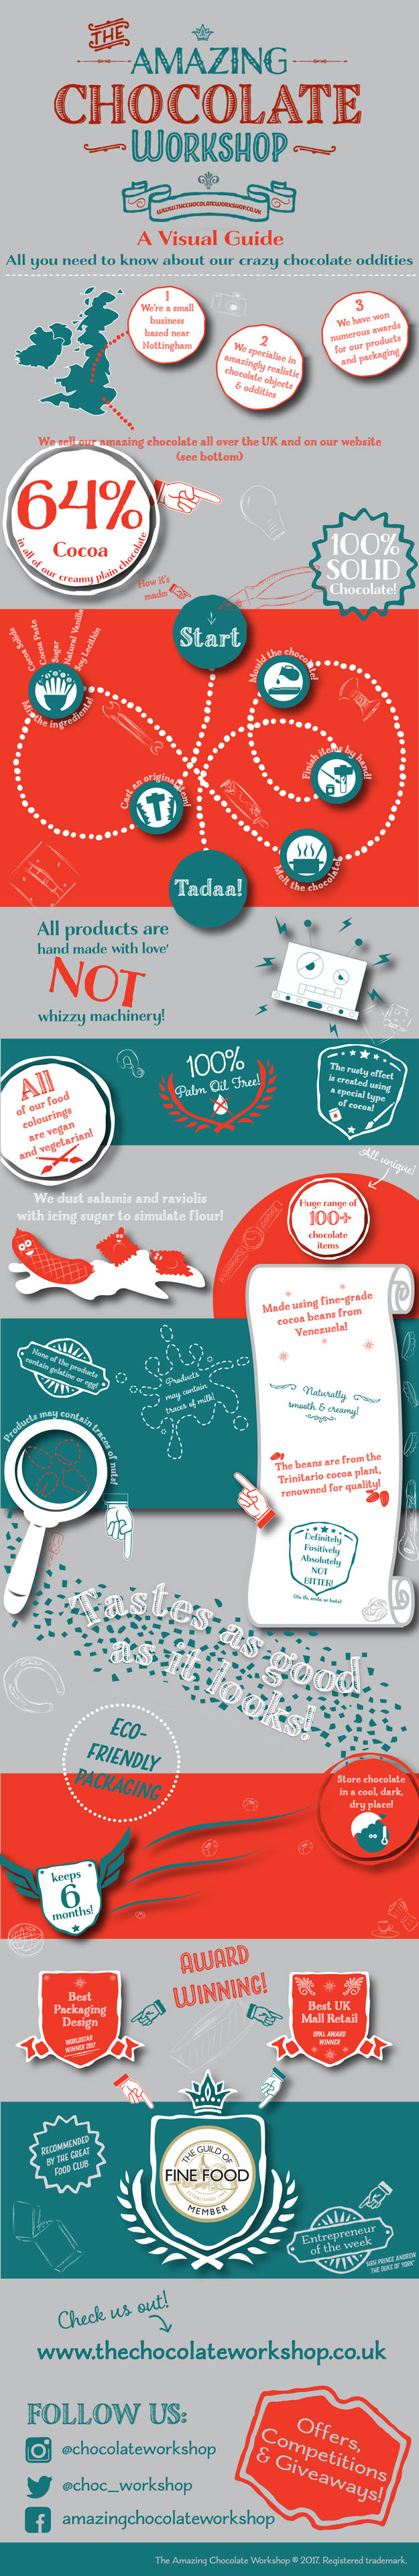 Amazing Chocolate Workshop Infographic